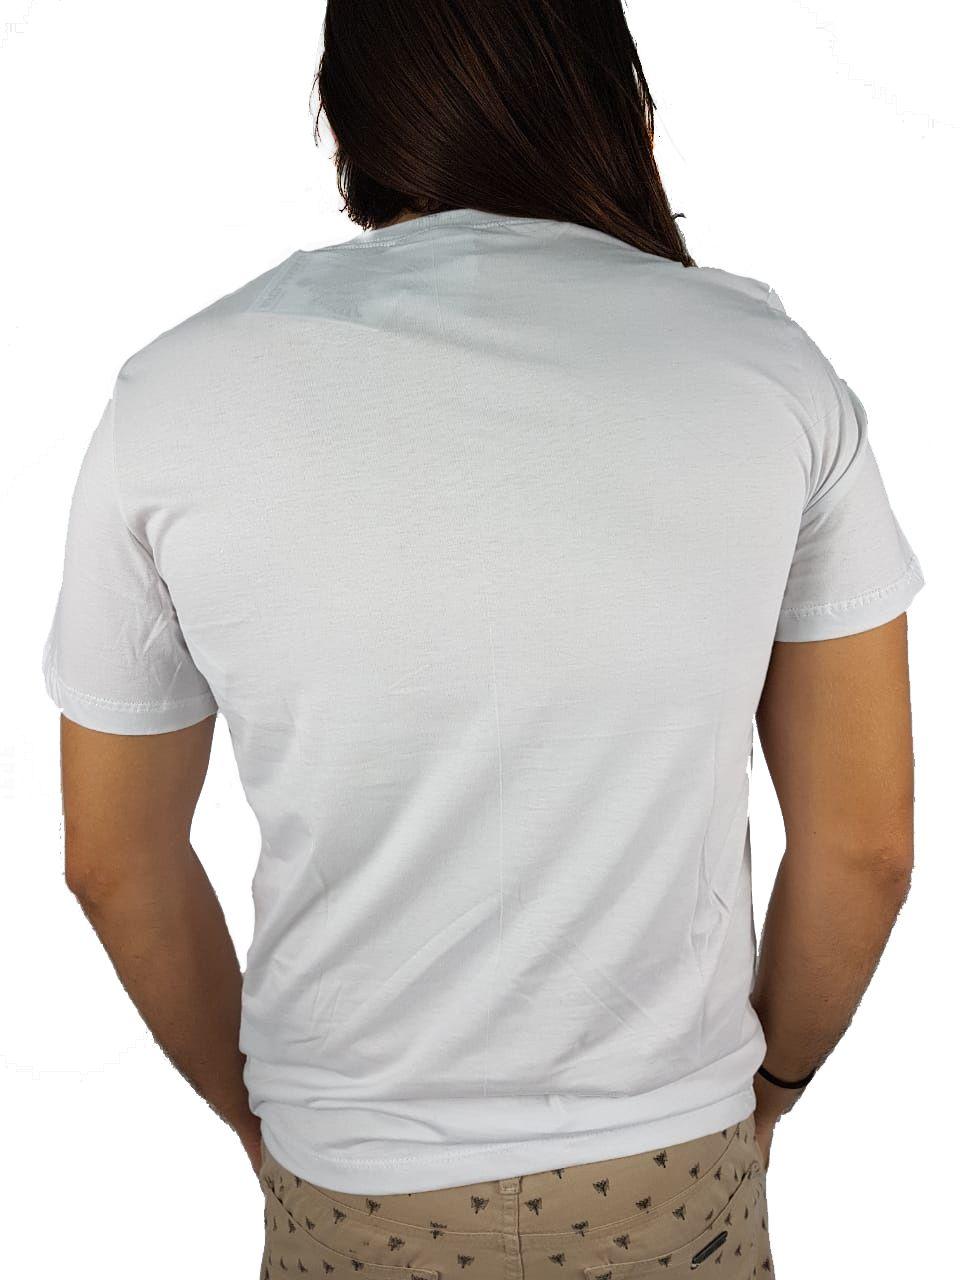 Camiseta Cavalera Masculina Manga Curta He Man